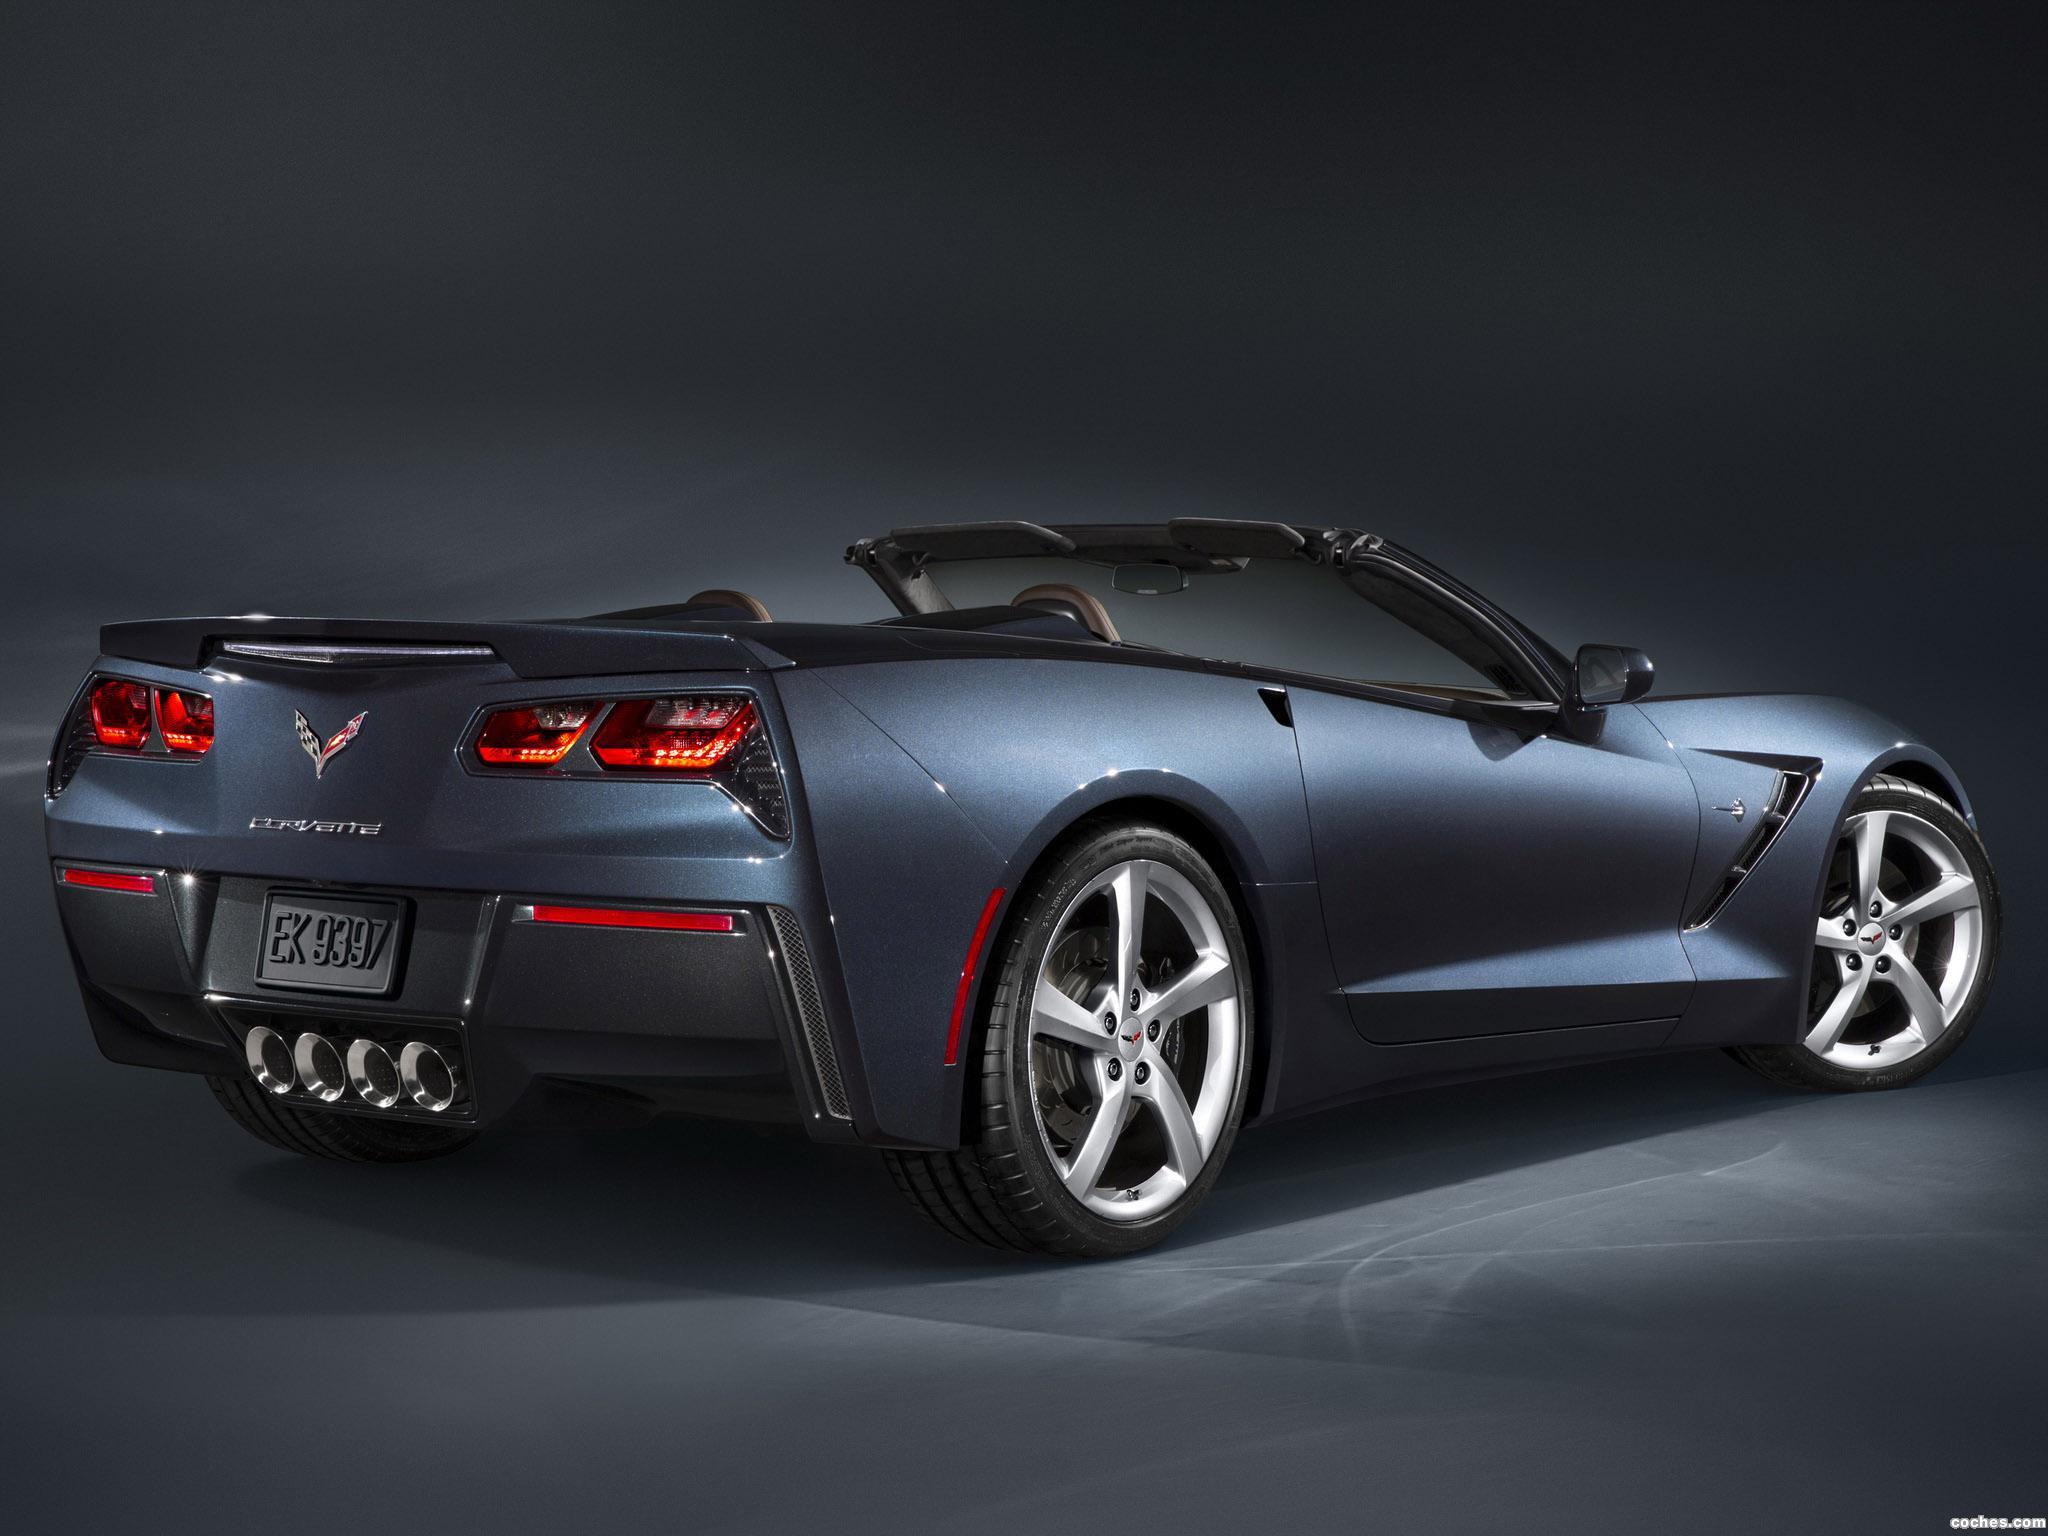 Foto 16 de Chevrolet Corvette Stingray Convertible C7 2013